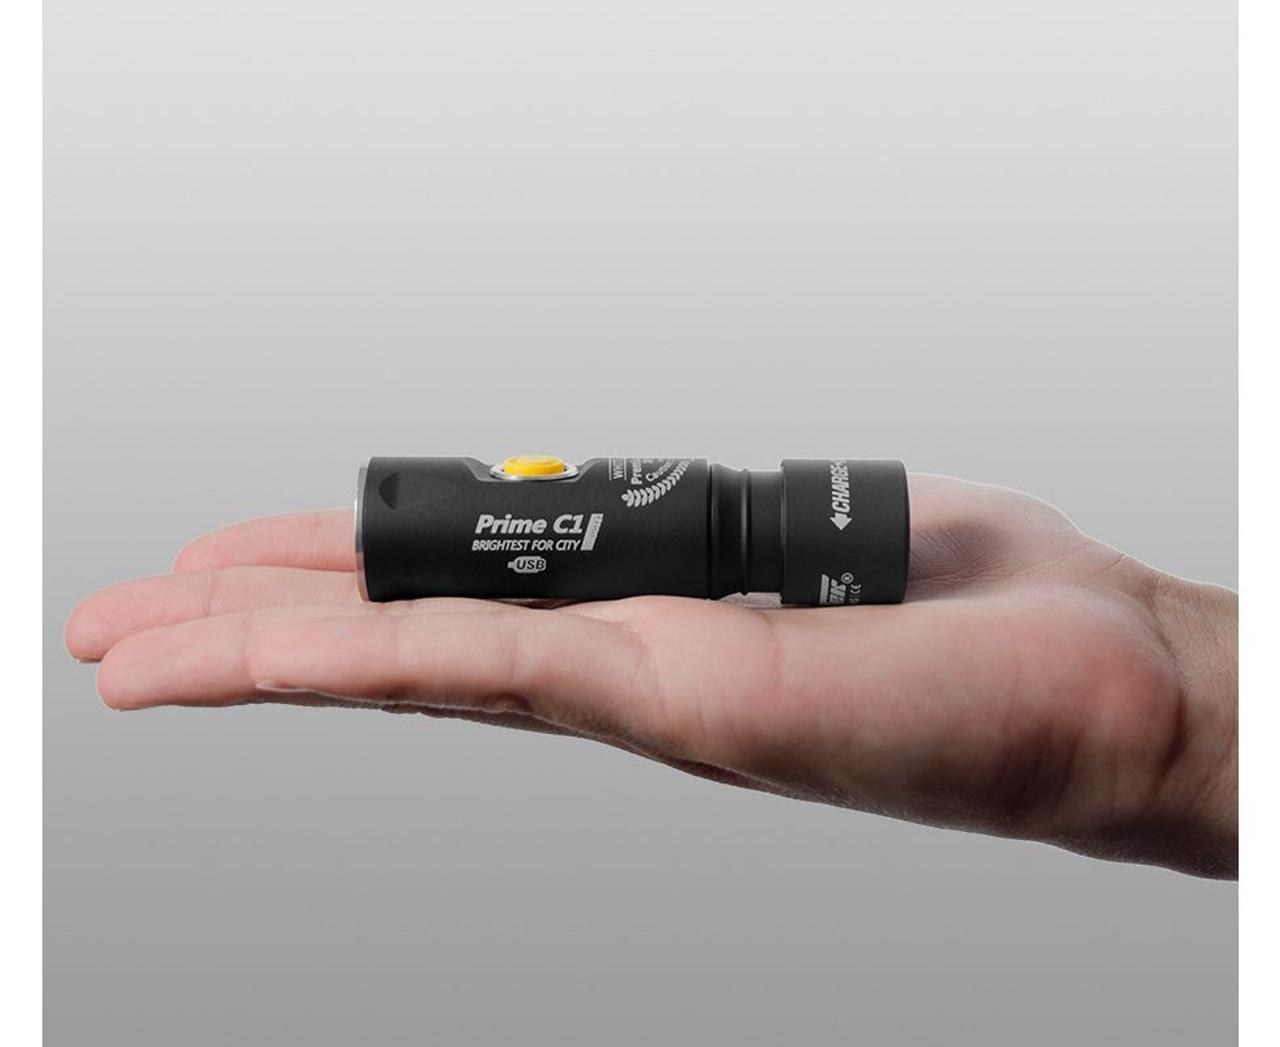 Armytek Prime C1 Pro Magnetic USB Rechargeble 1050 Lumen White